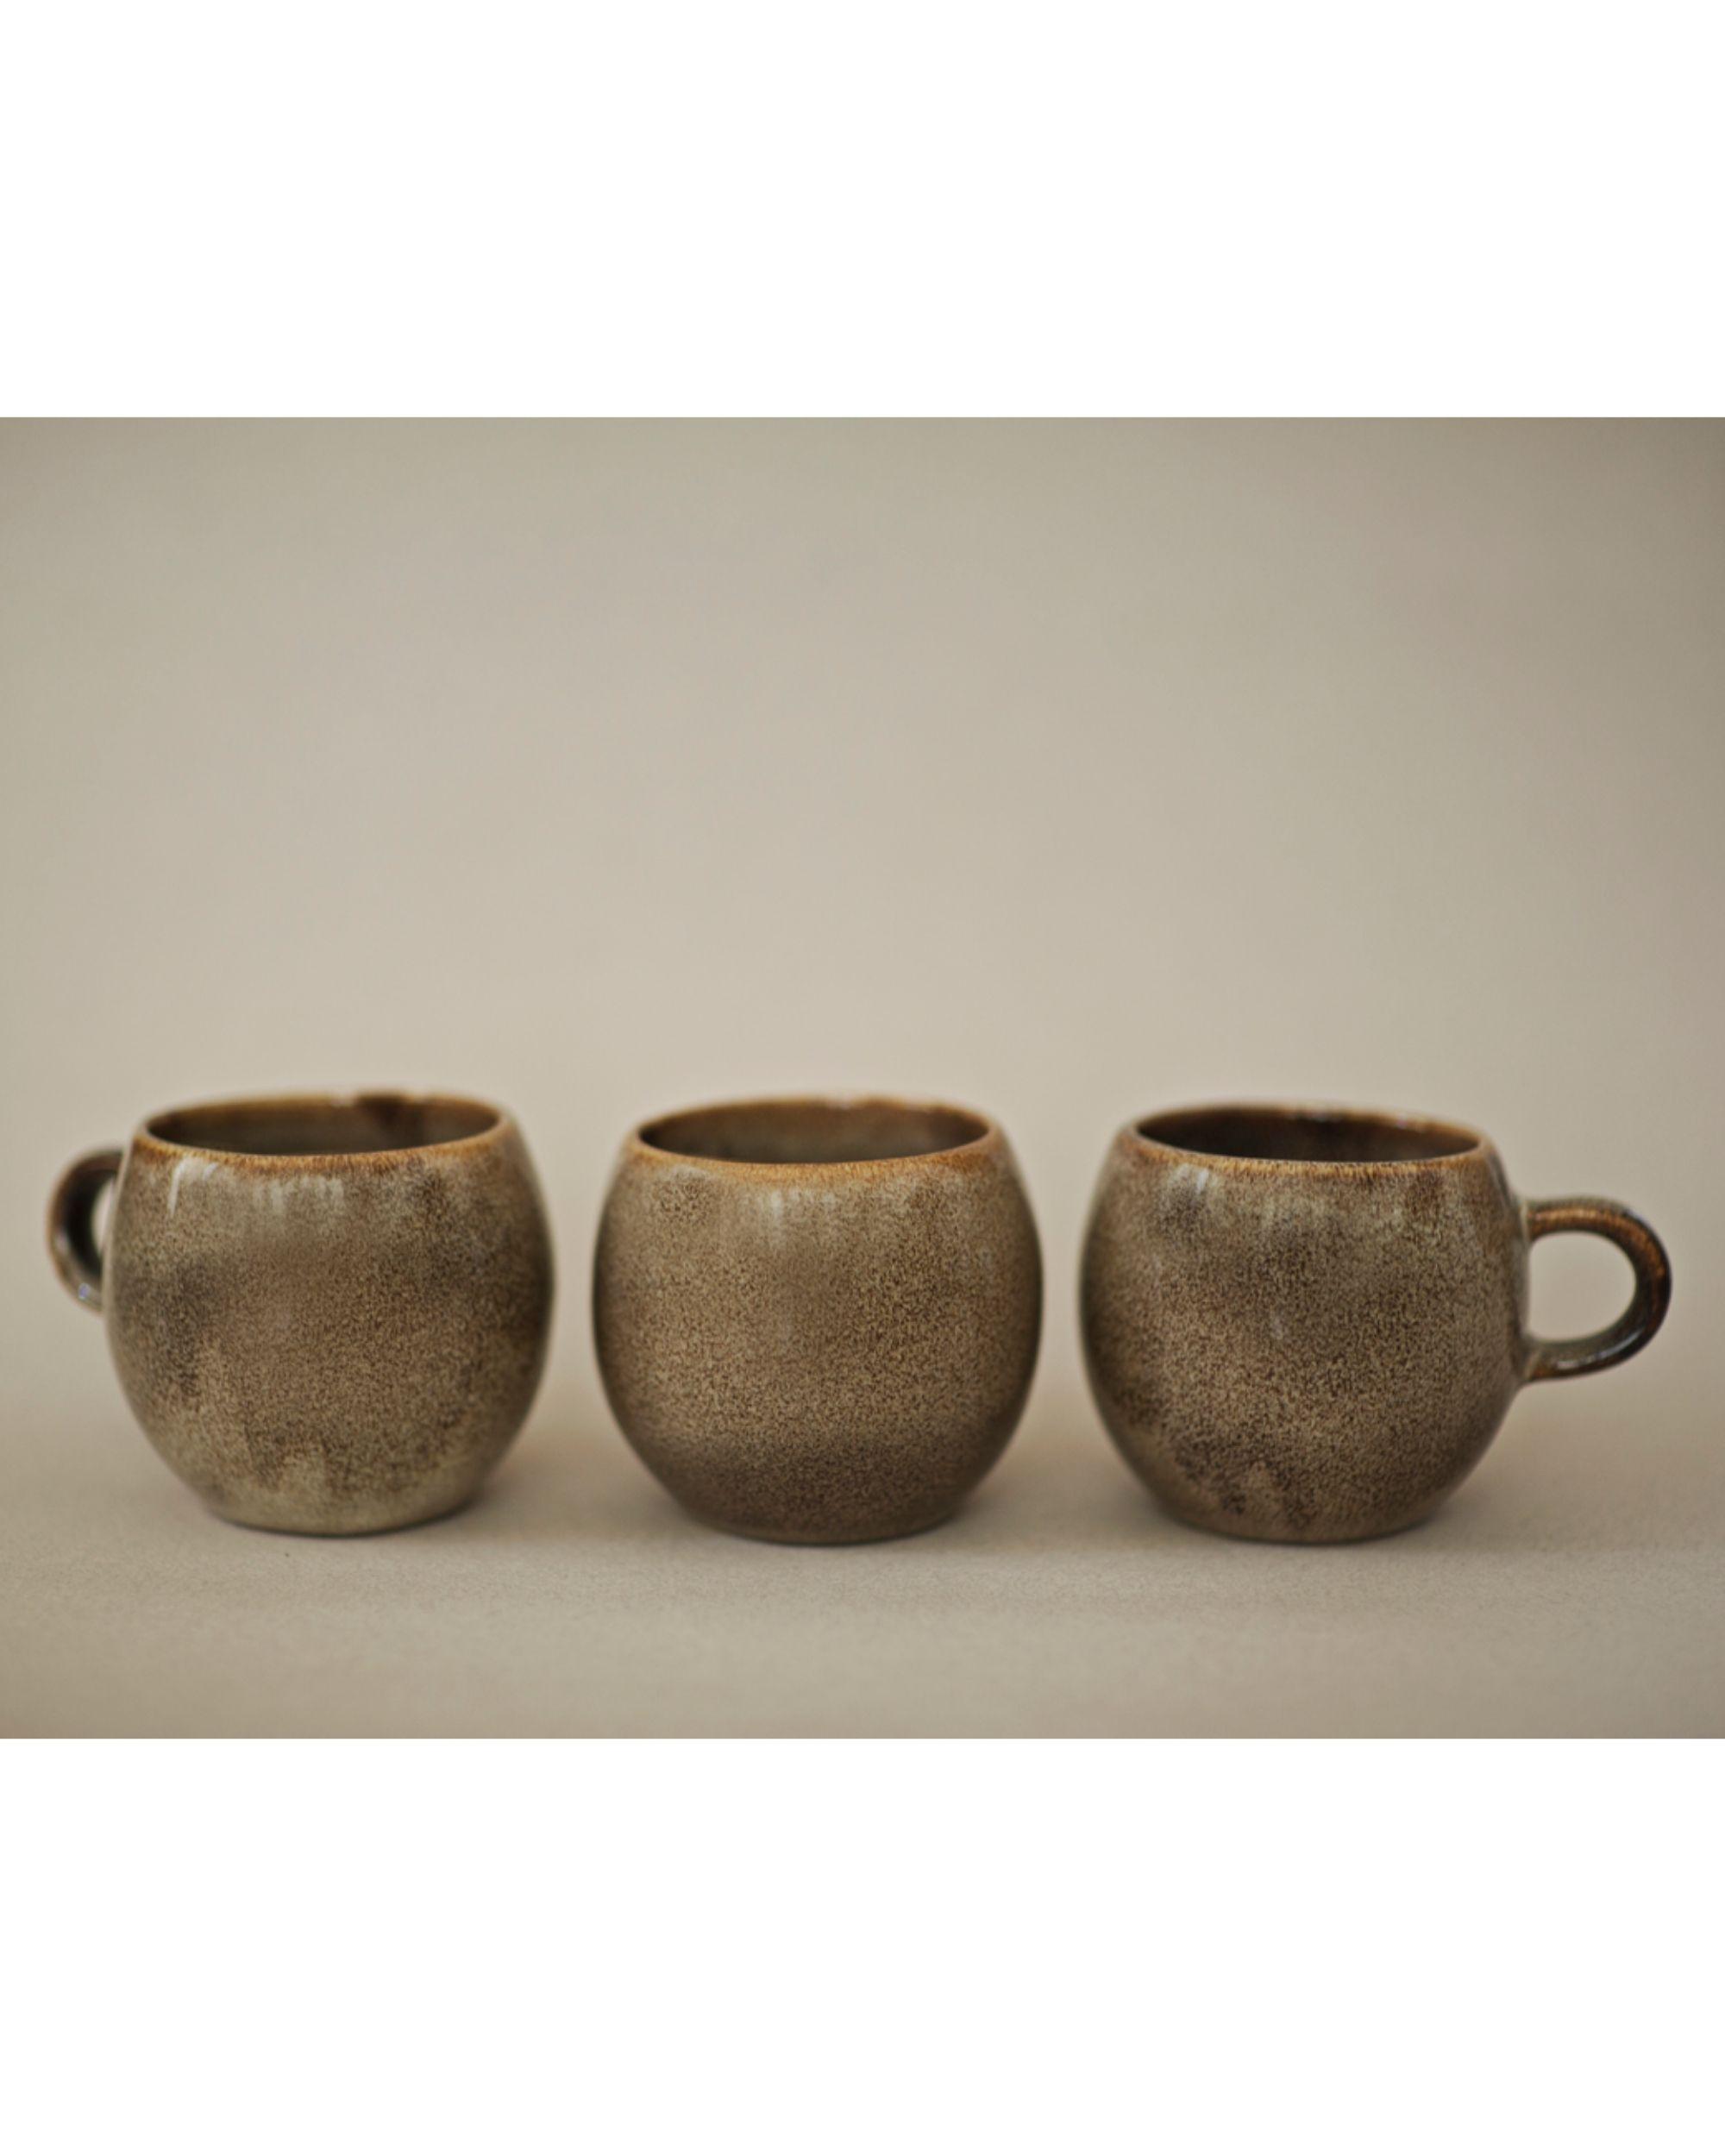 Sandstone coffee mugs - set of two